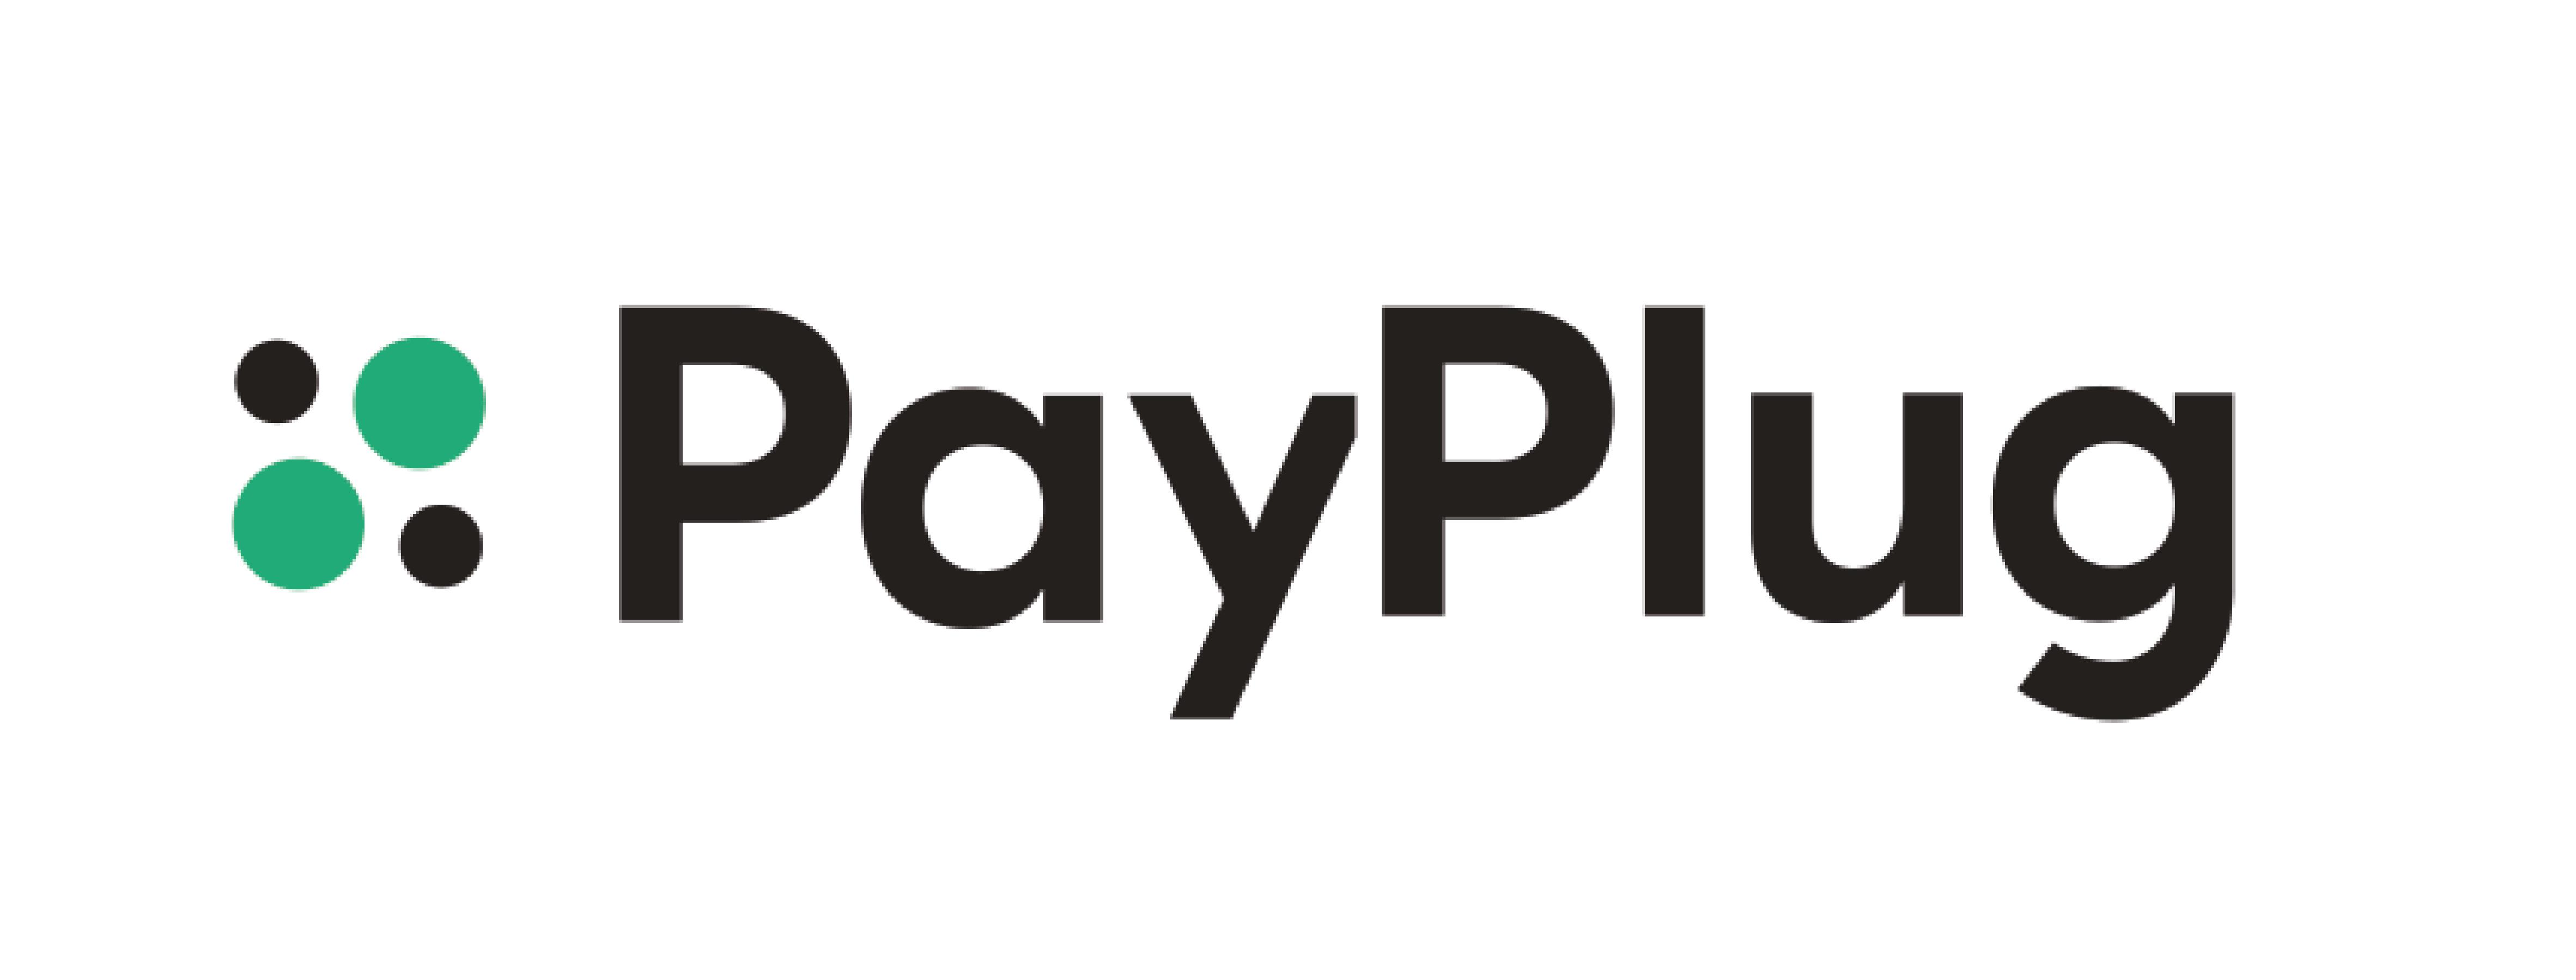 payplug-logo-nidyanet